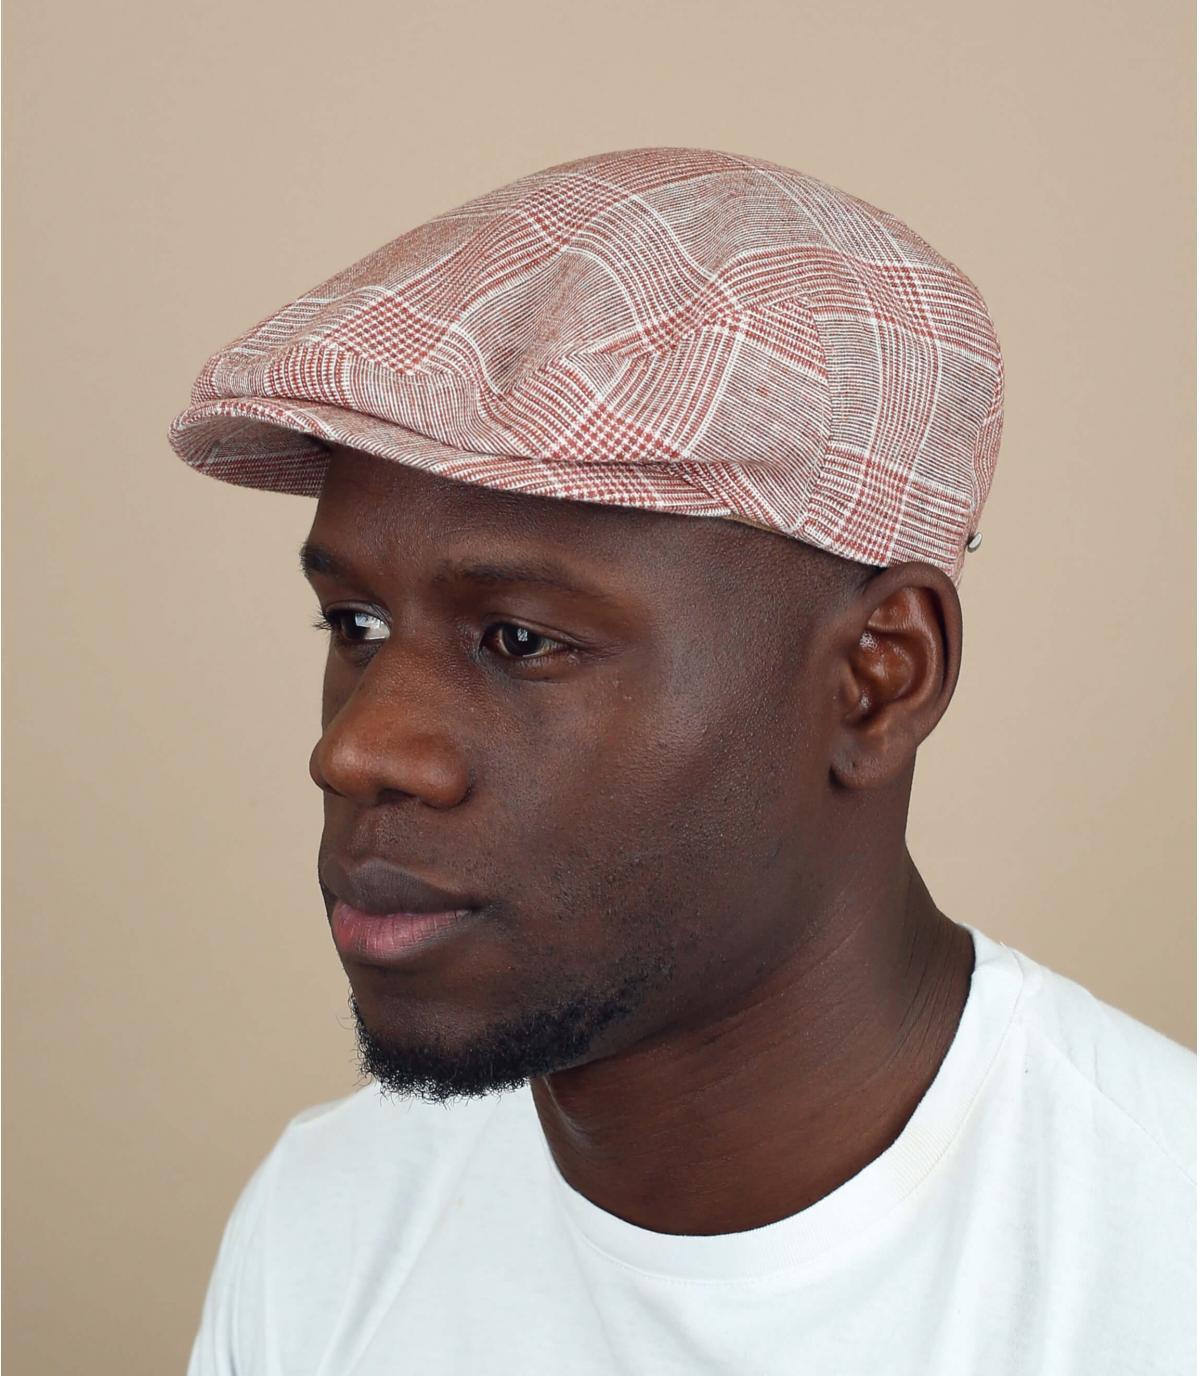 gorra lino cuadros rojo